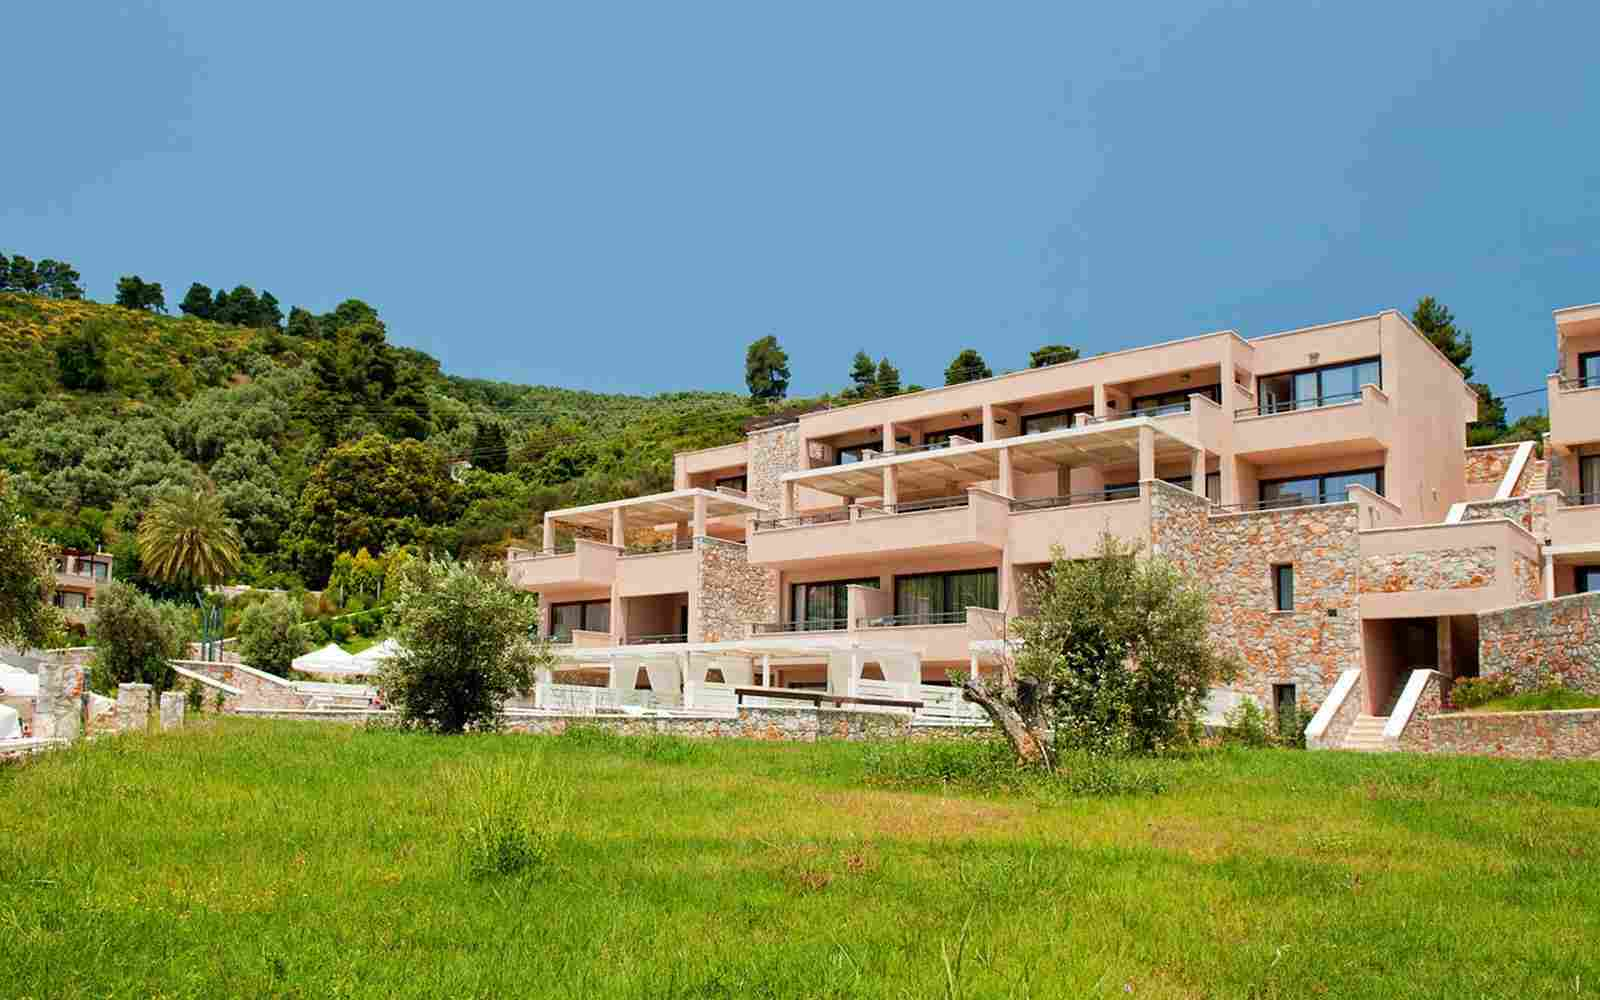 https://www.bellacosta.org/wp-content/uploads/2016/03/summer-hotel-01.jpg